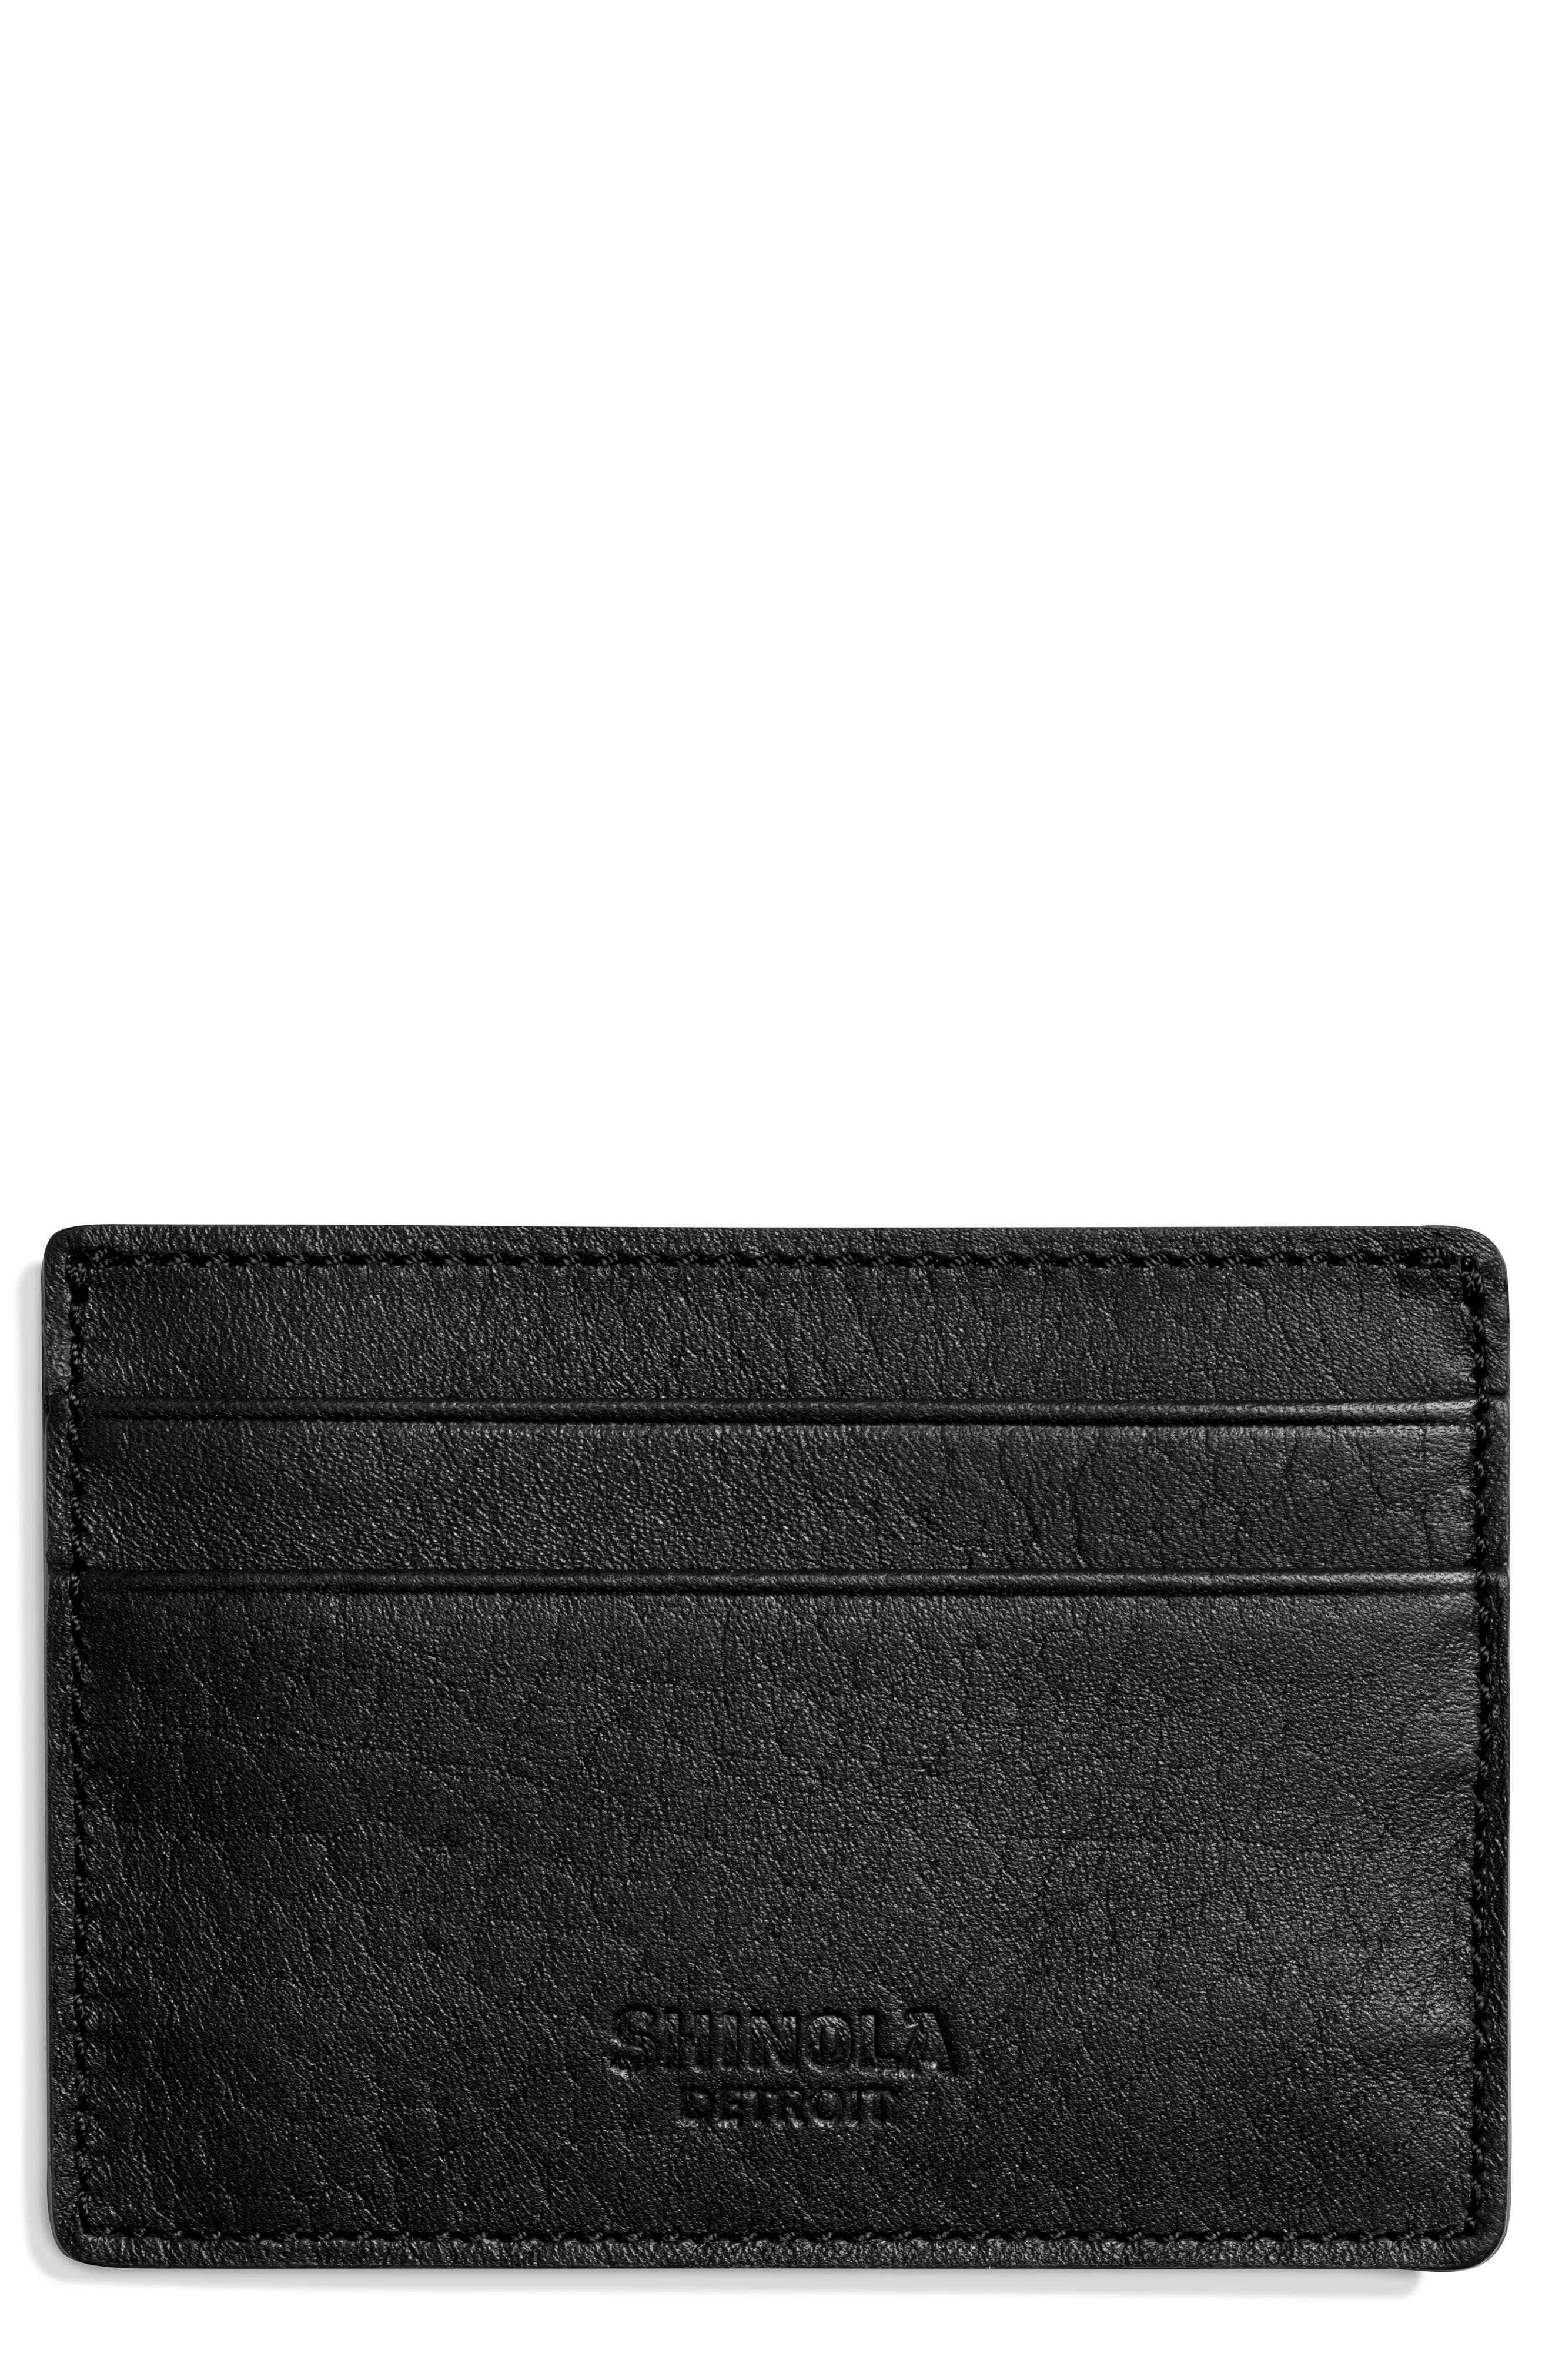 Main Image - Shinola Leather Card Case